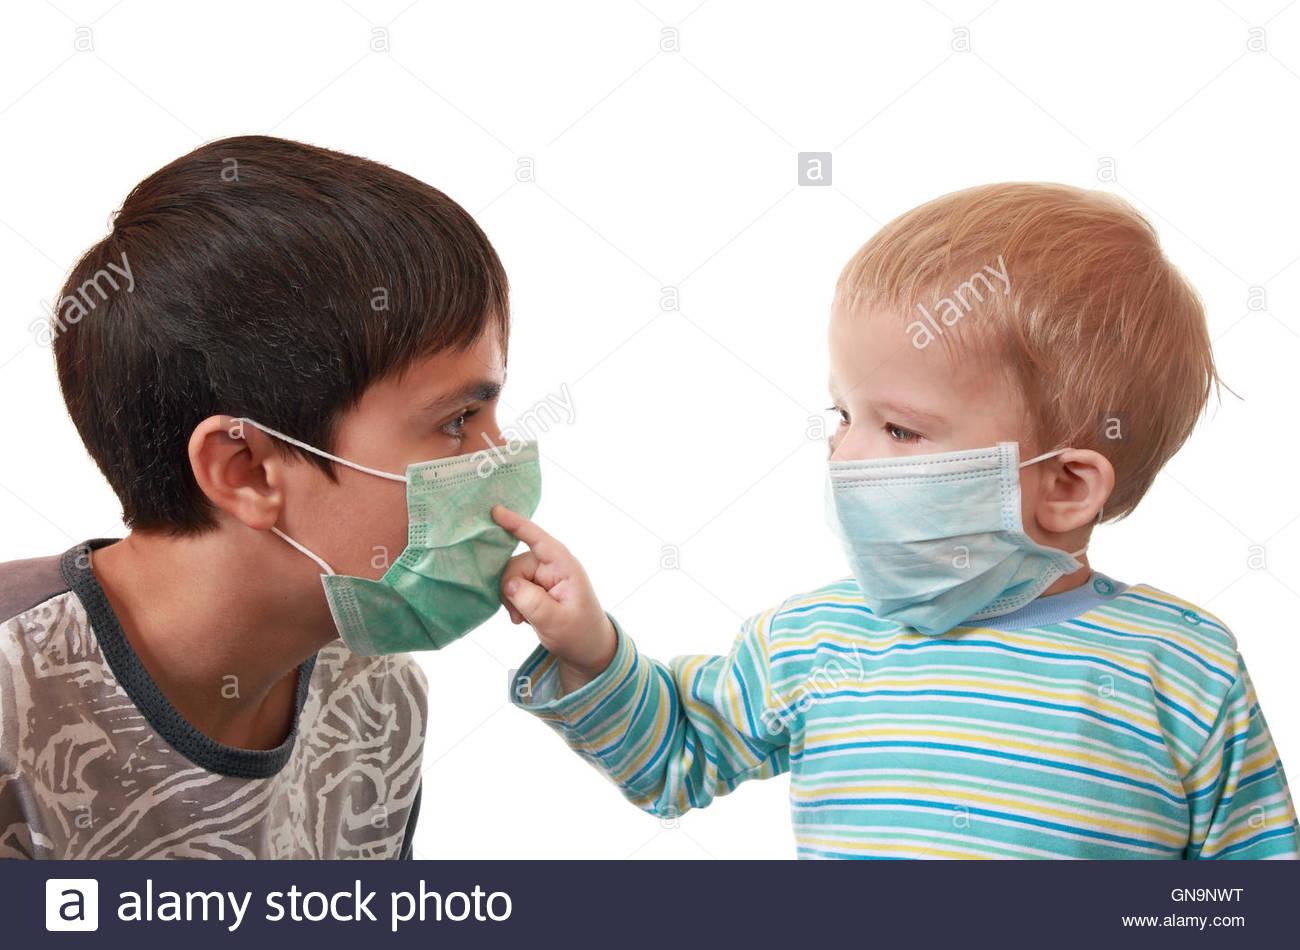 Masks Children Stock - Alamy Photo In Medical 116384740